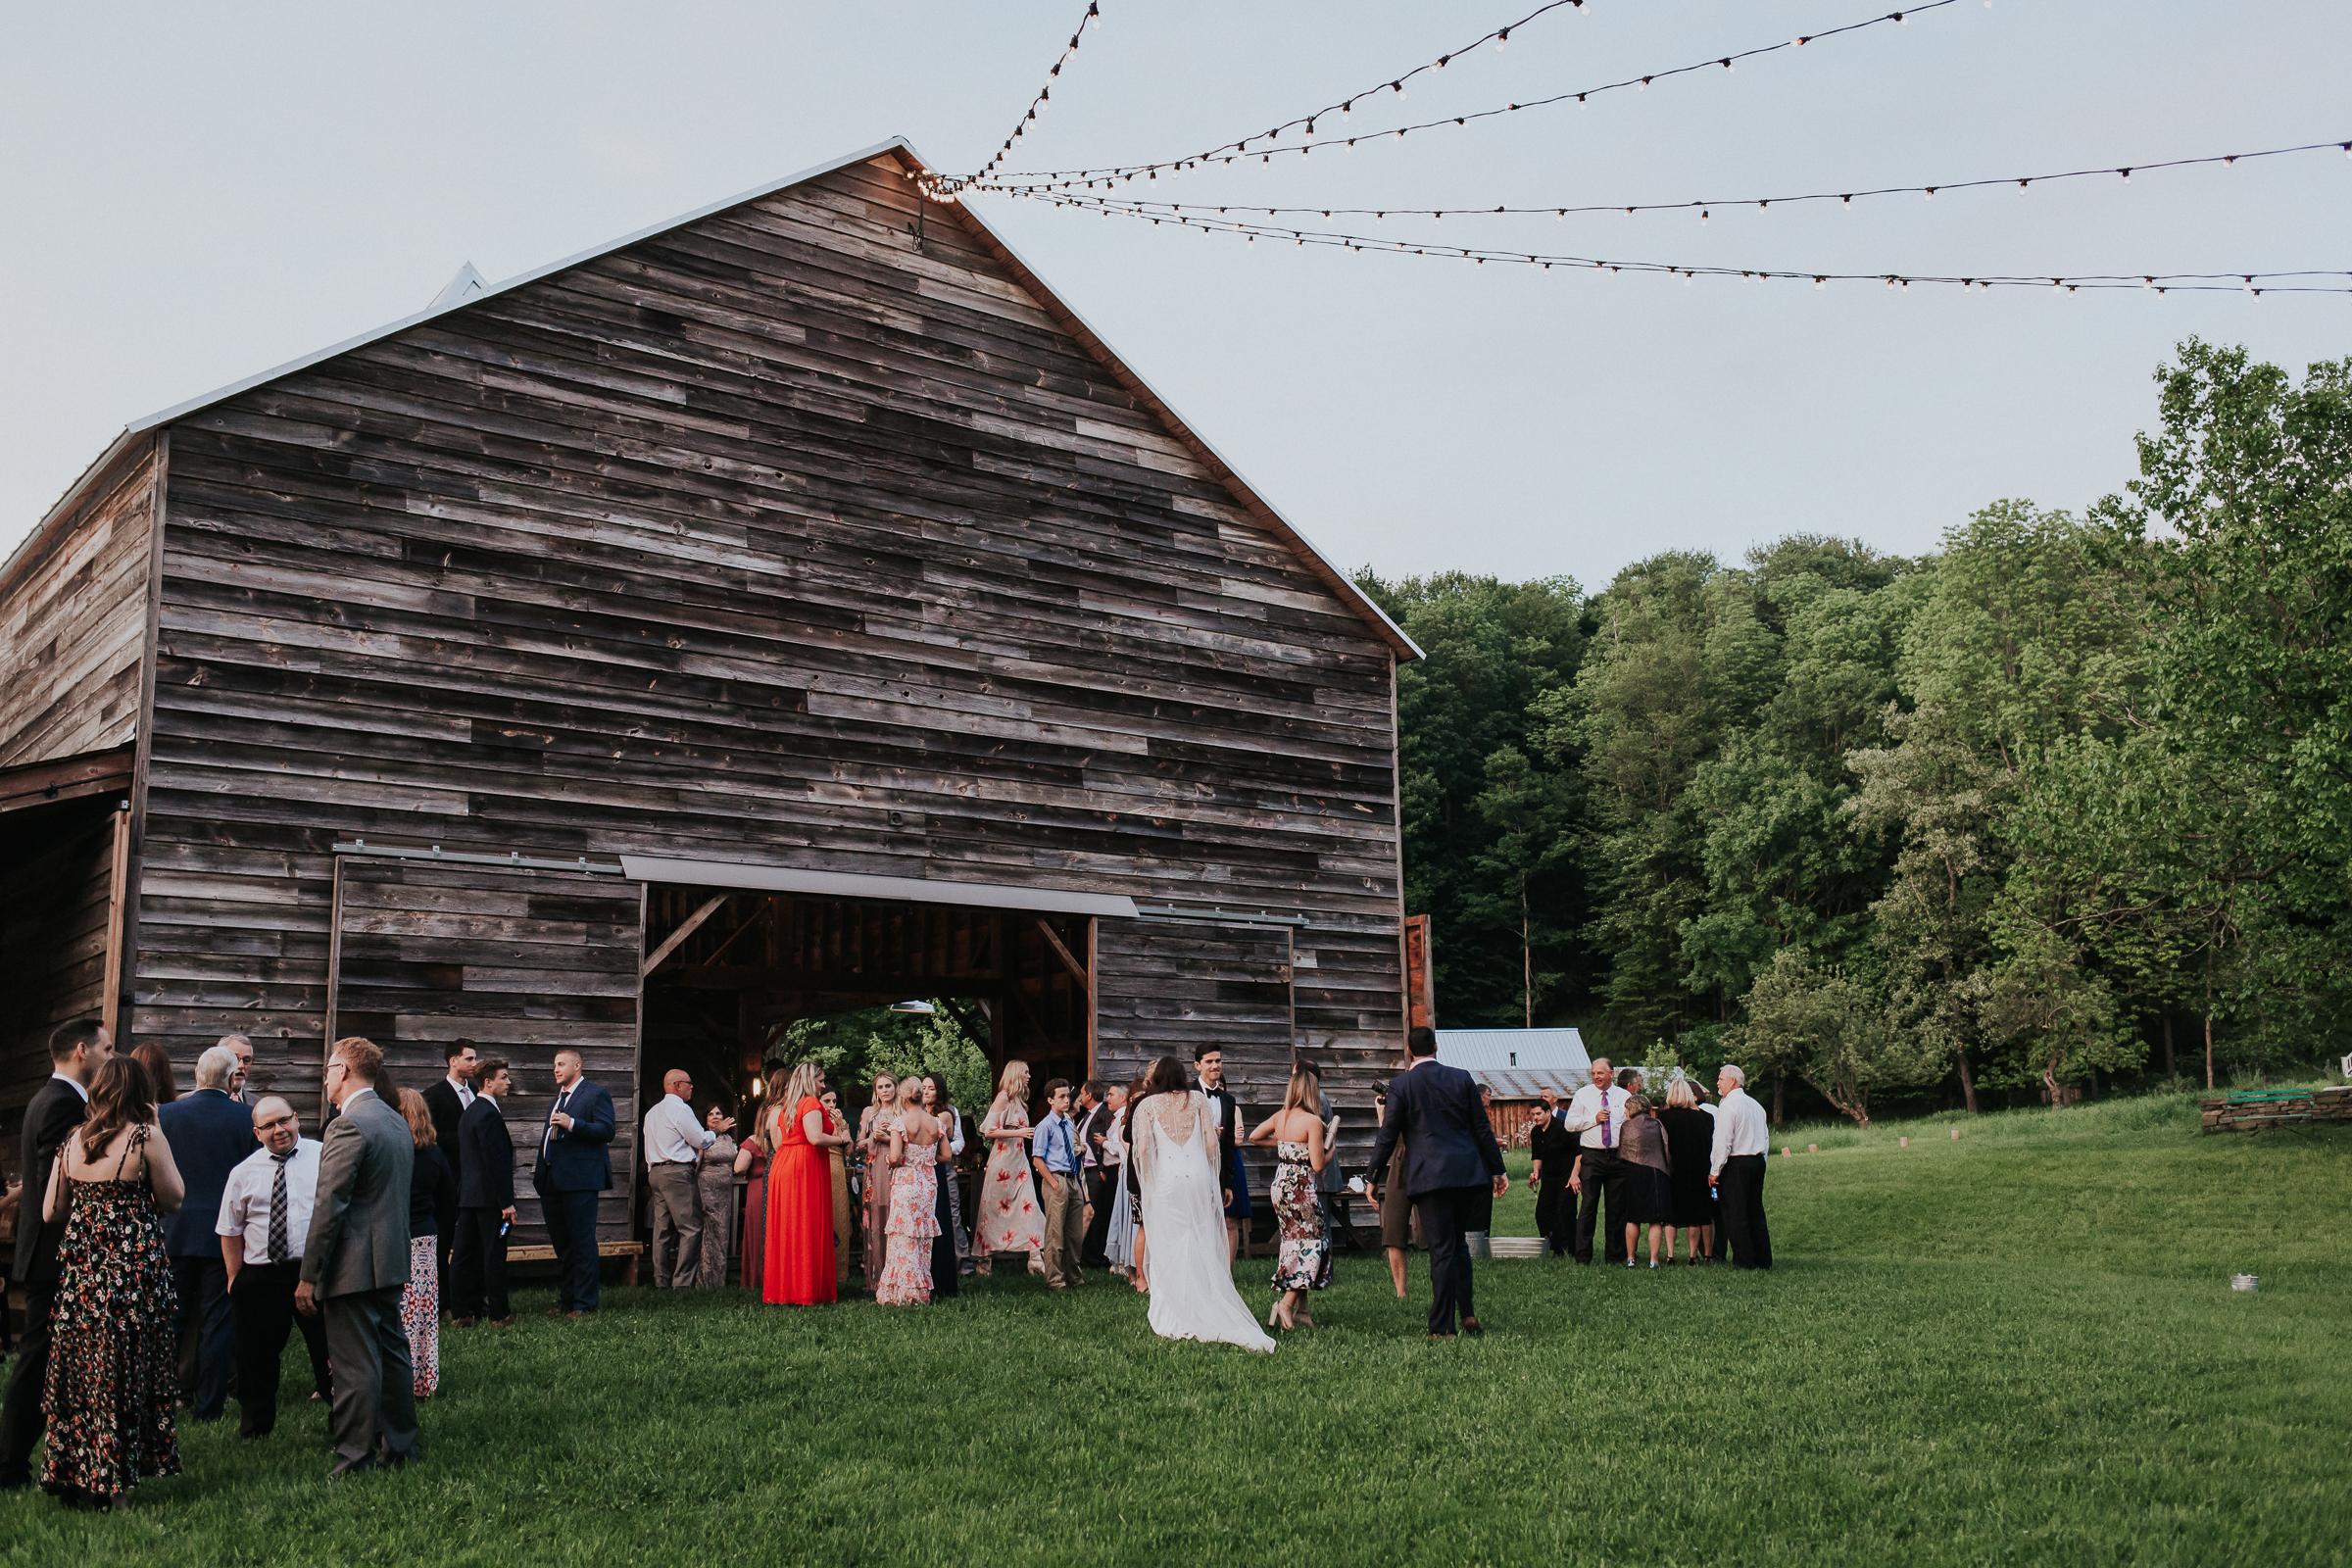 Handsome-Hollow-Long-Eddy-Catskills-New-York-Fine-Art-Documentary-Wedding-Photographer-127.jpg